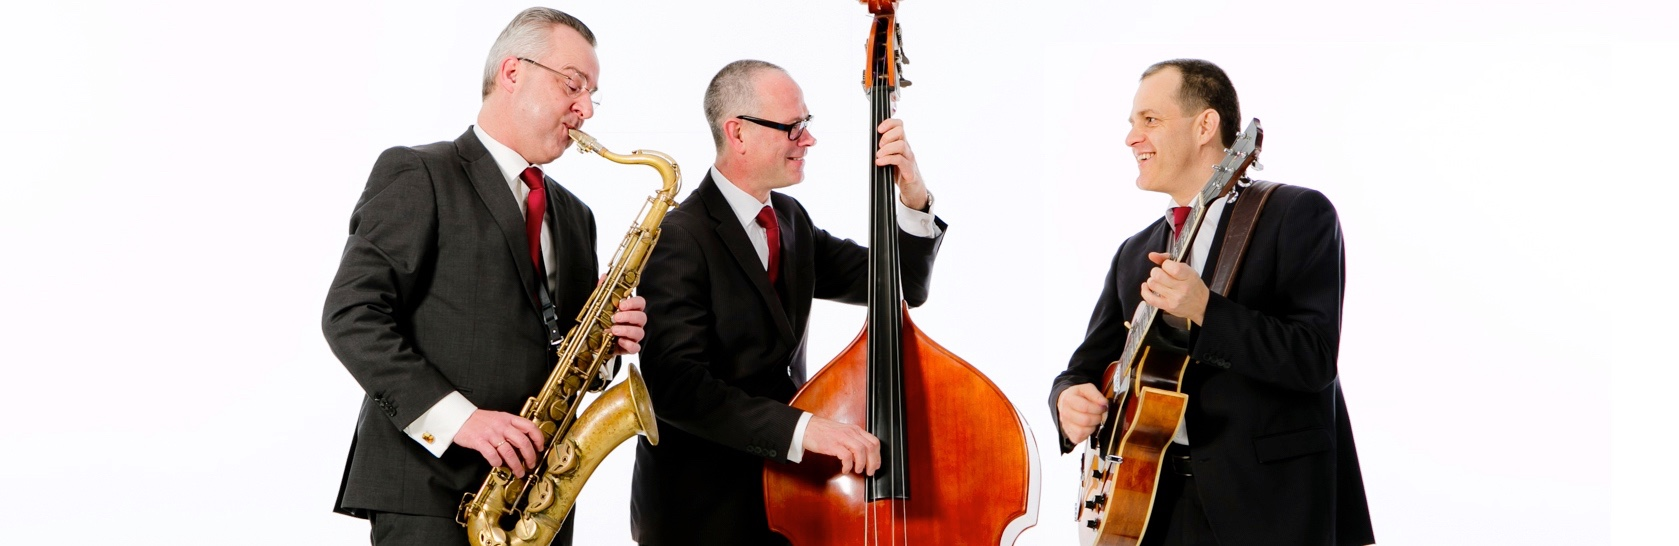 Achtergrondmuziek Jazz Trio | Ascot Jazz Trio